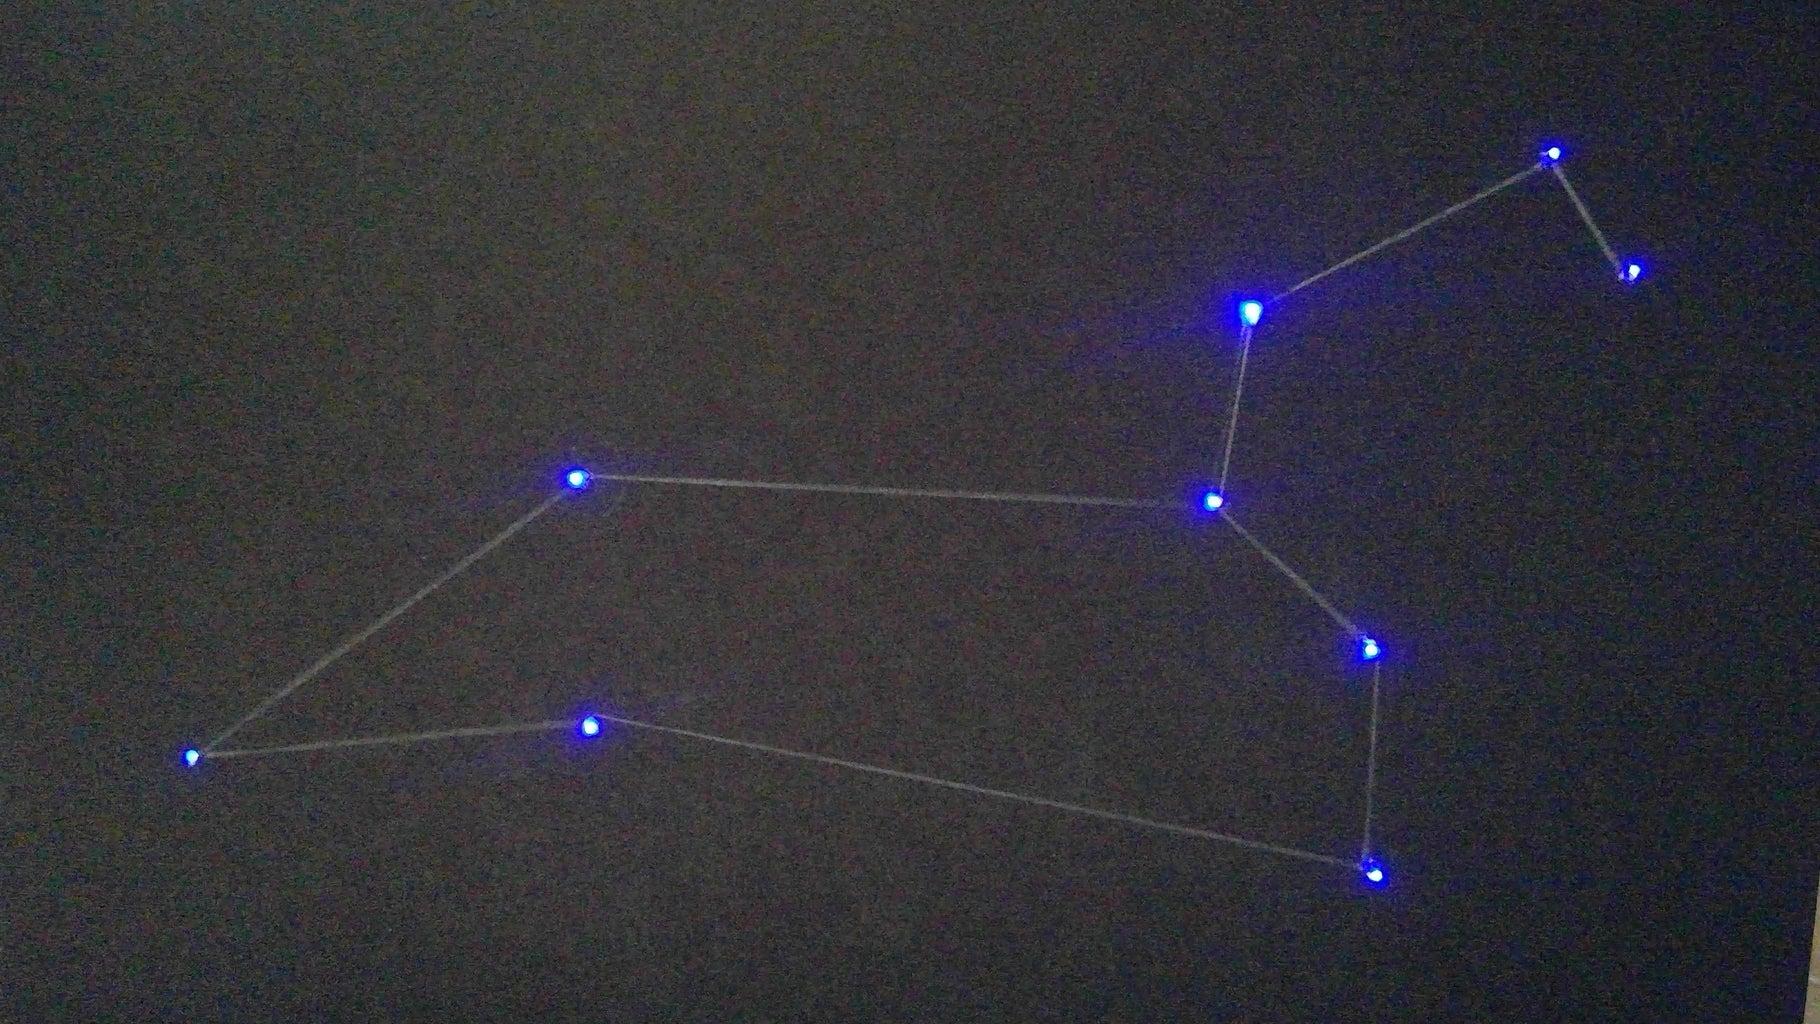 LED and Fiber Optic Star Constellation